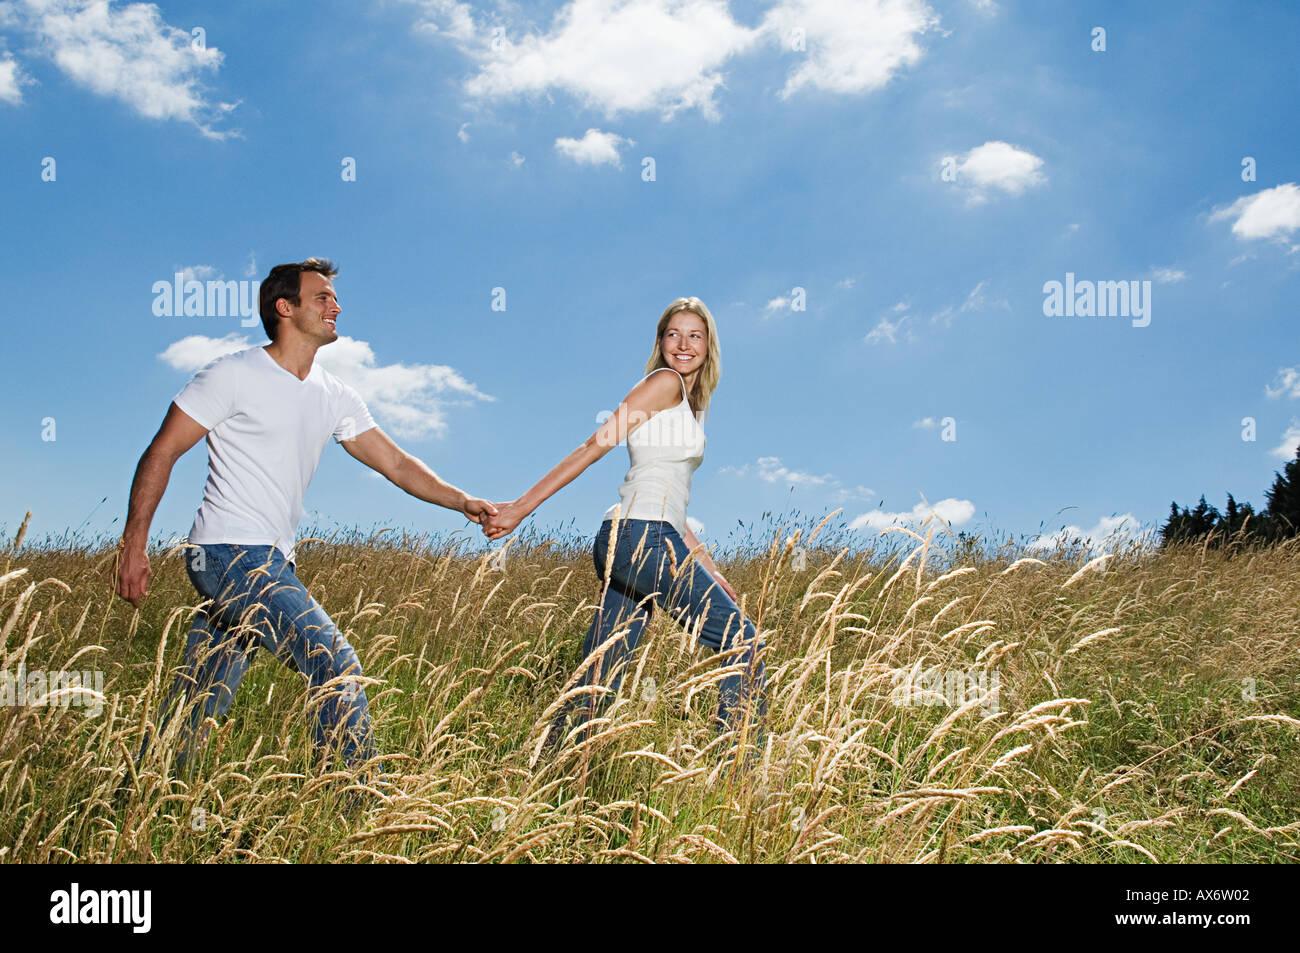 Couple walking in a field Stock Photo